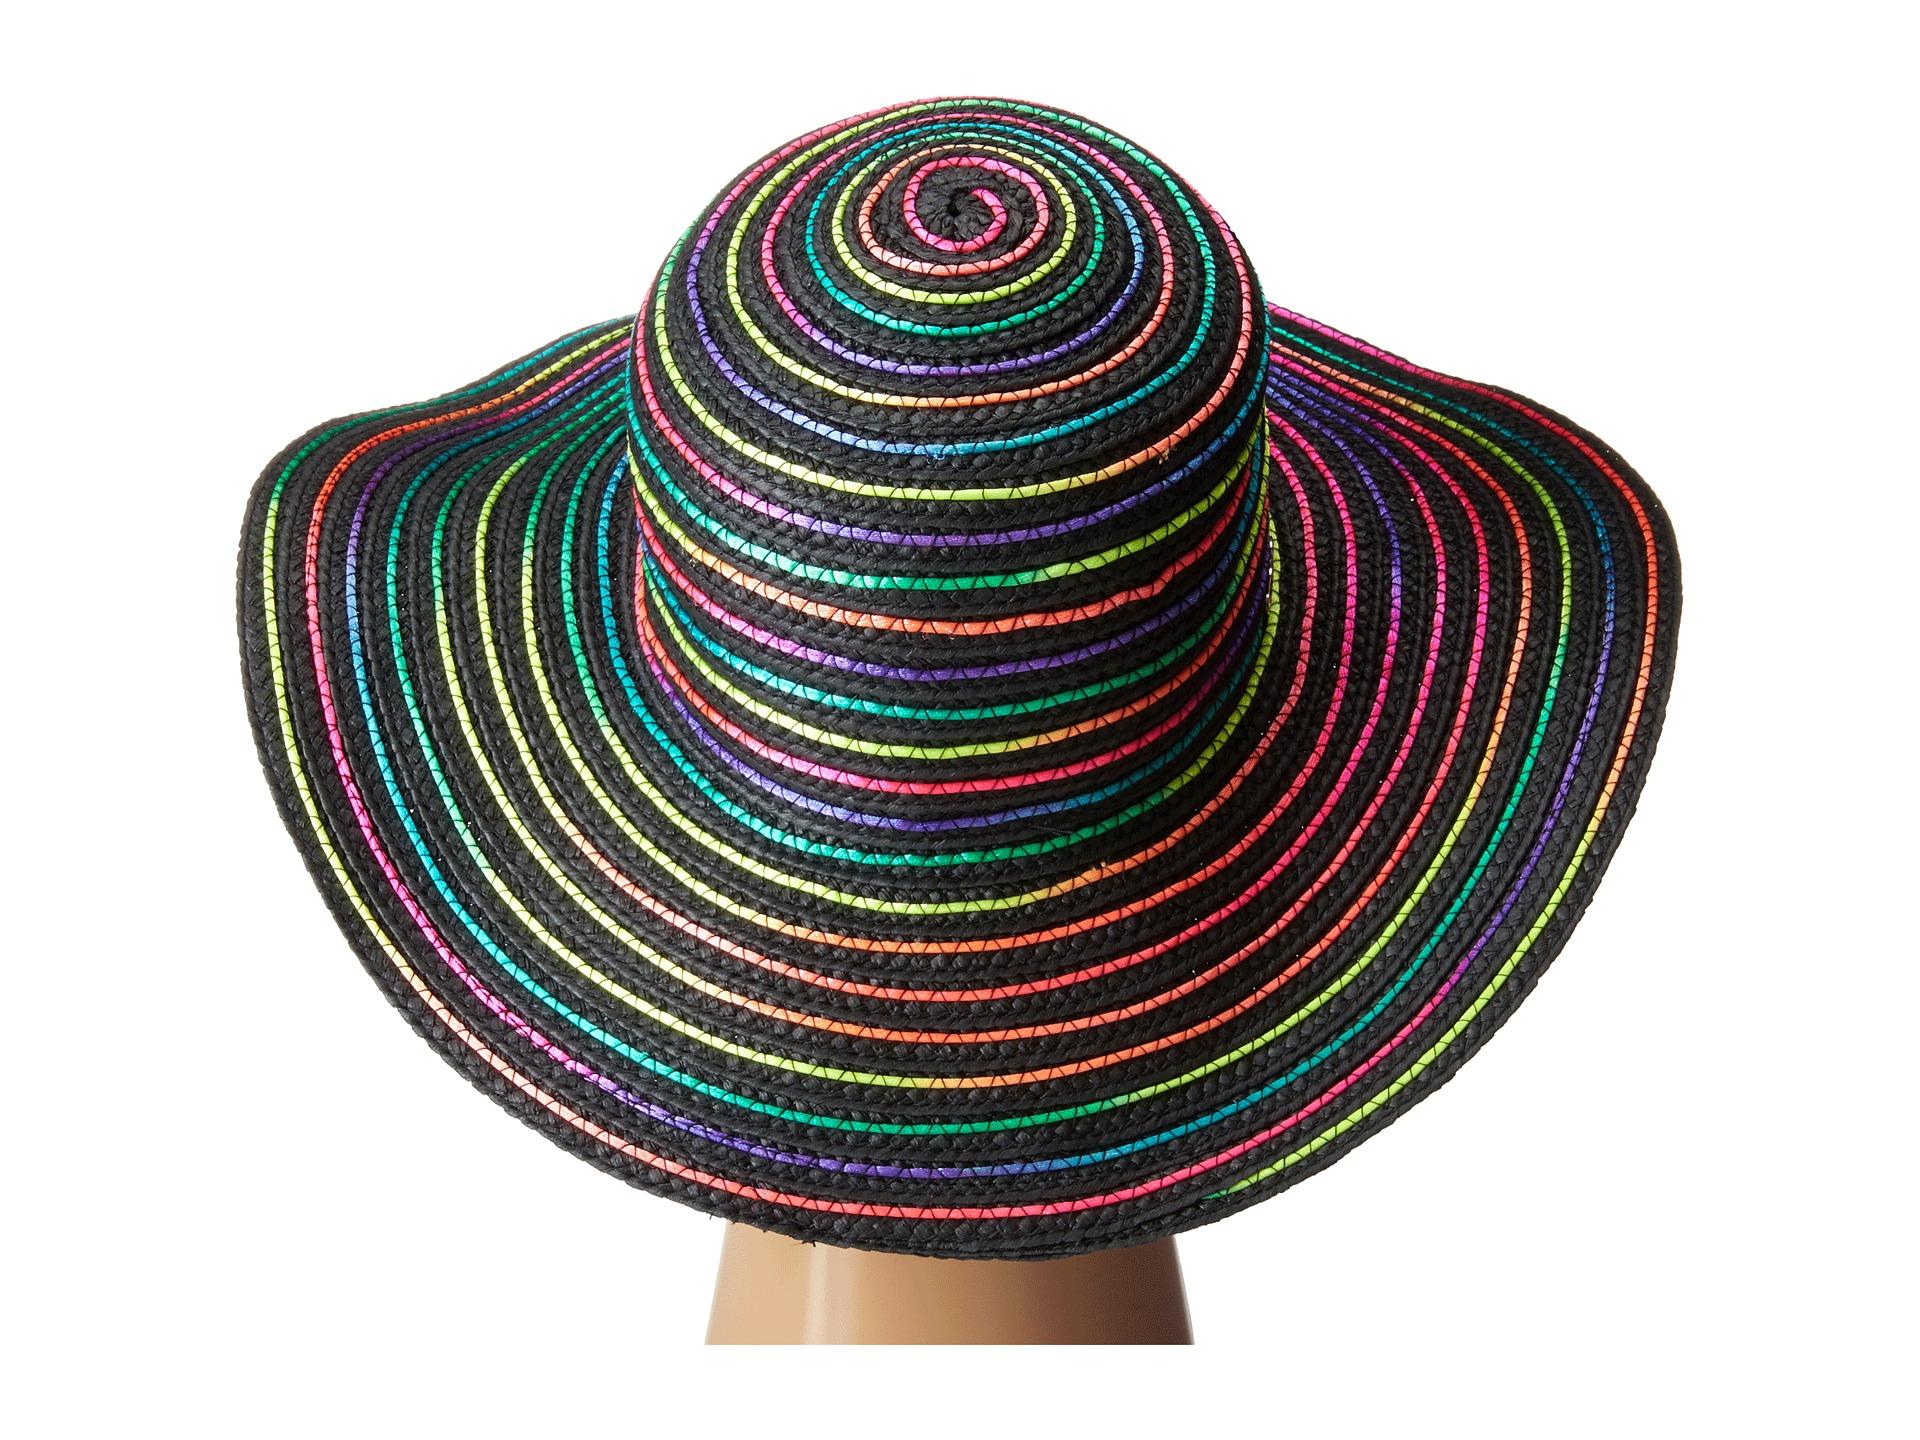 5f55292db9 Betsey Johnson Rainbow Swirl Floppy Hat in Gray - Lyst